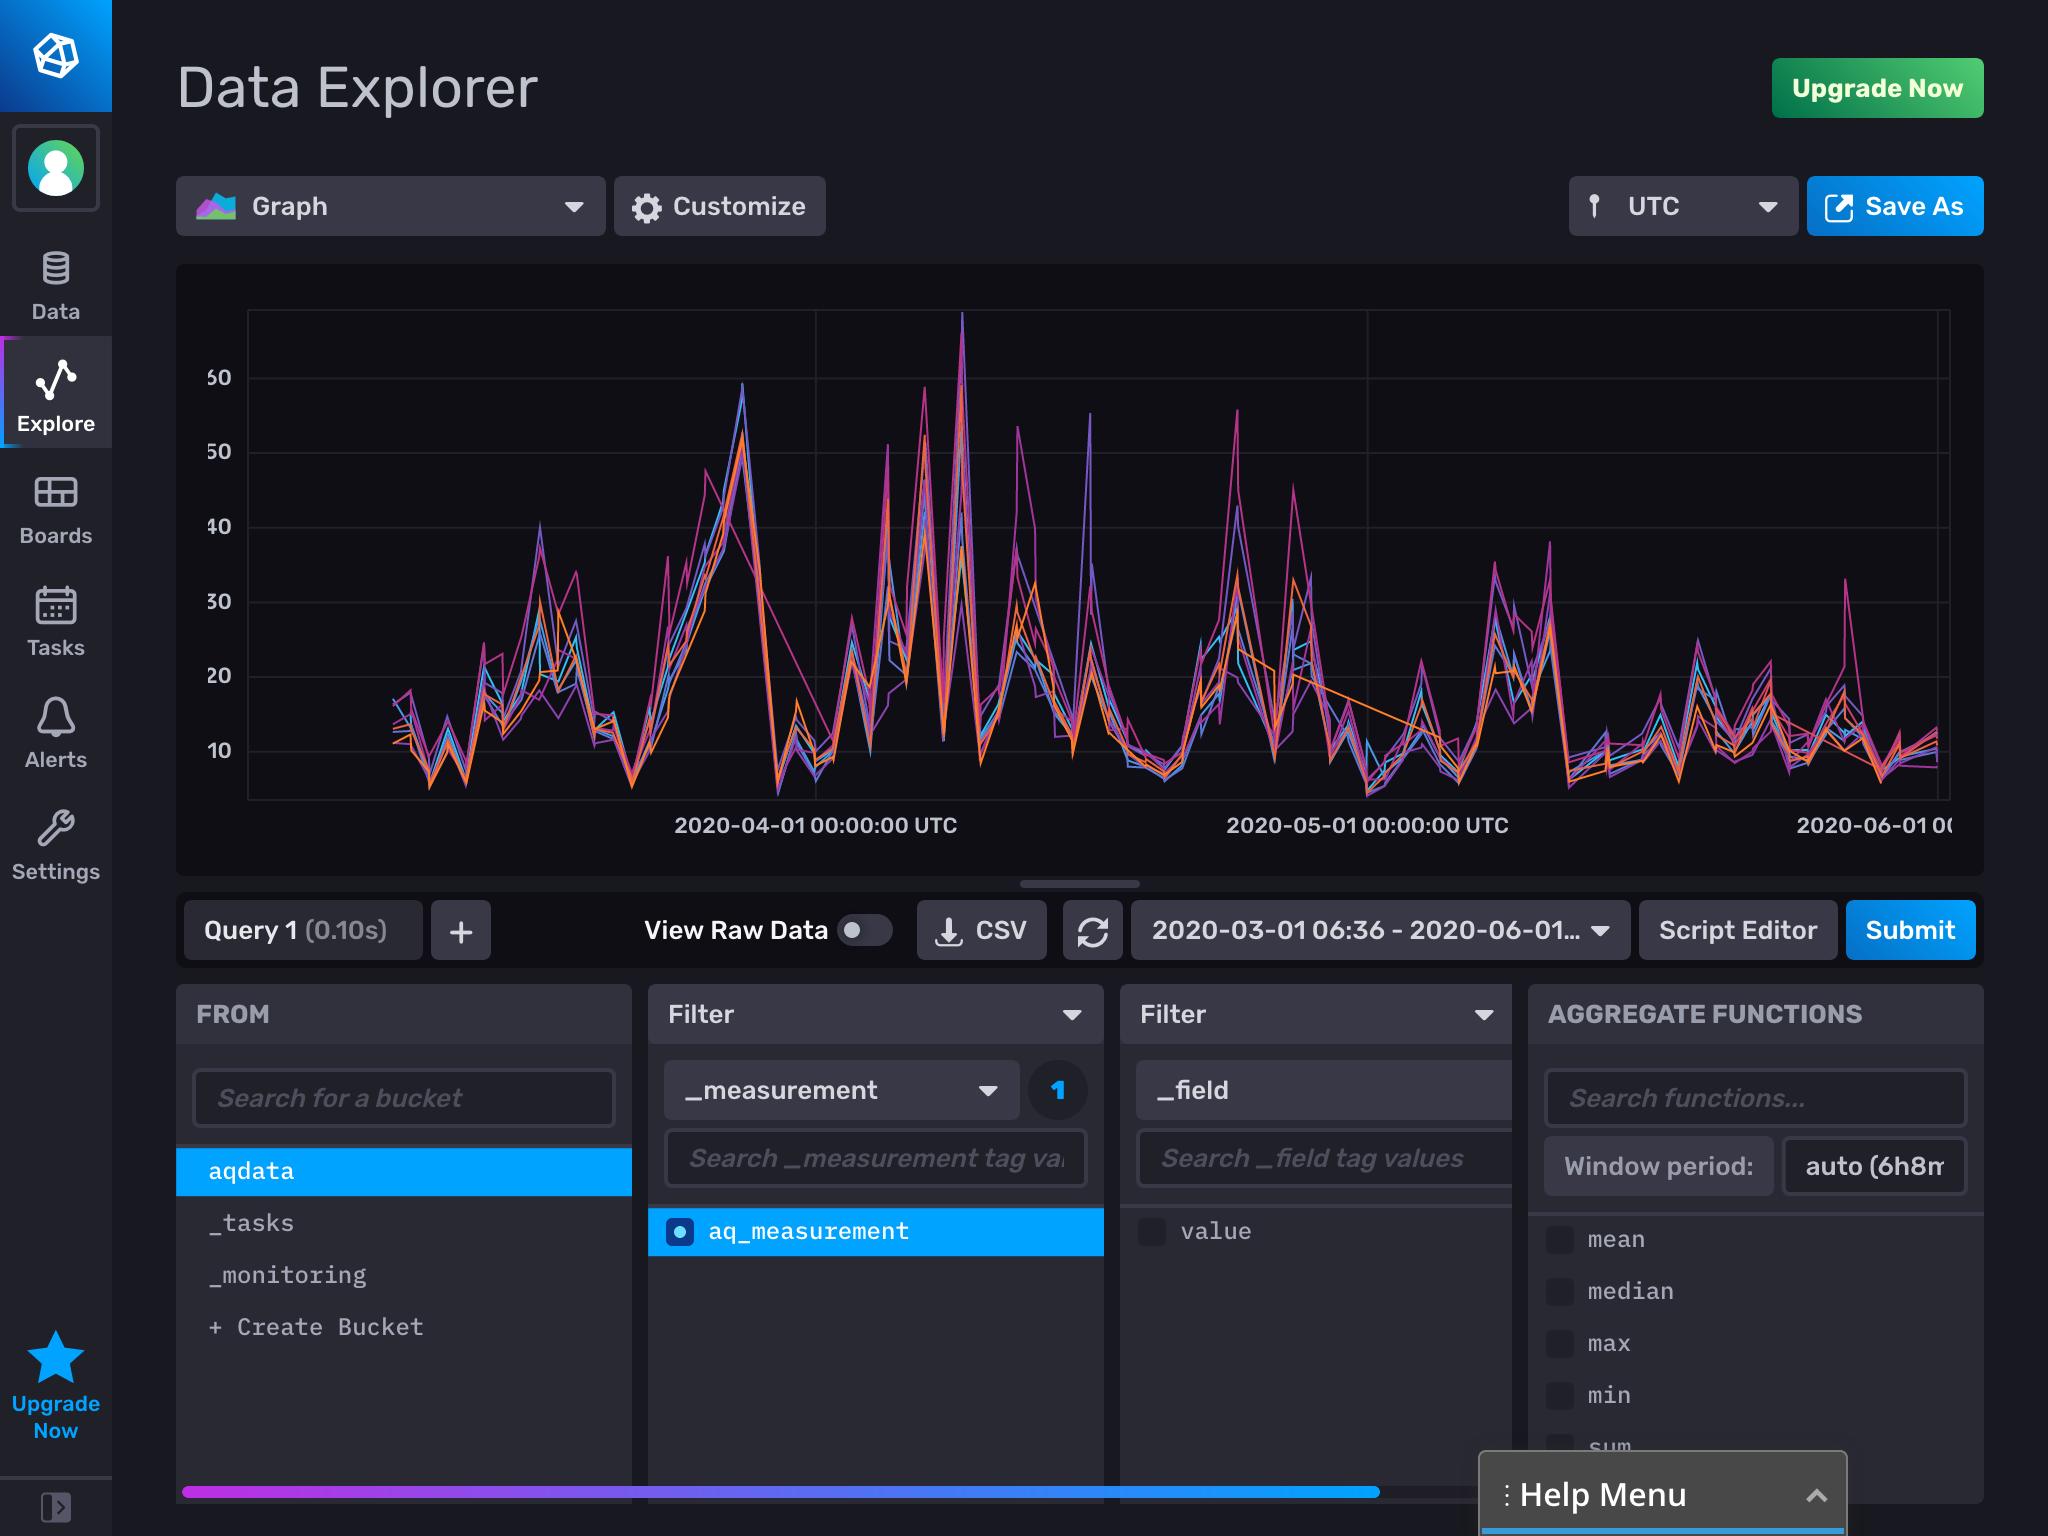 Data Explorer with visualization